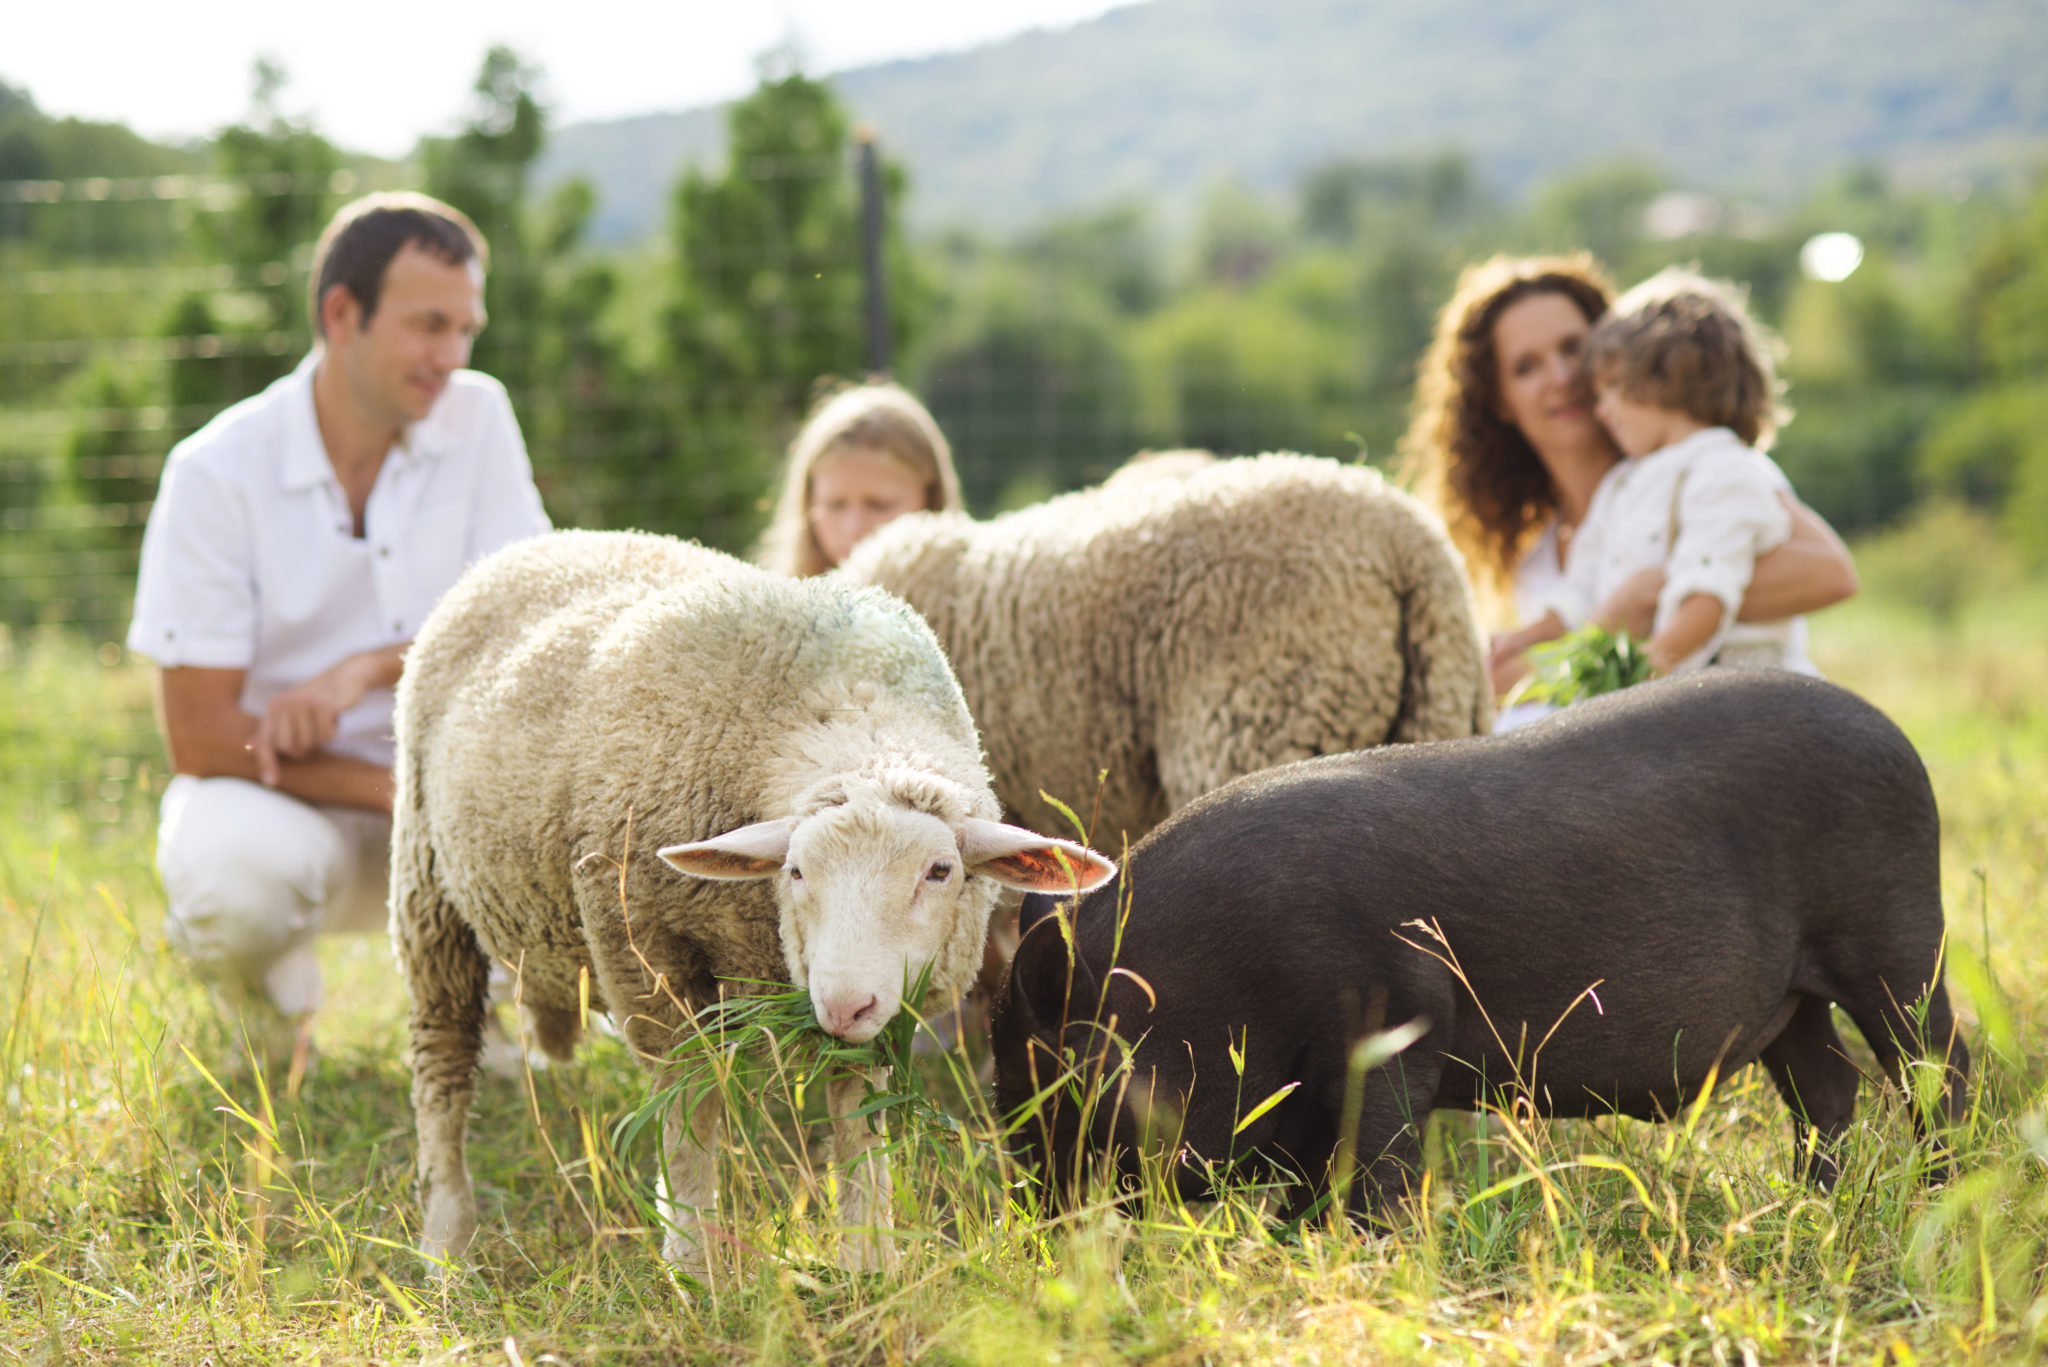 Family feeding sheep on the farm